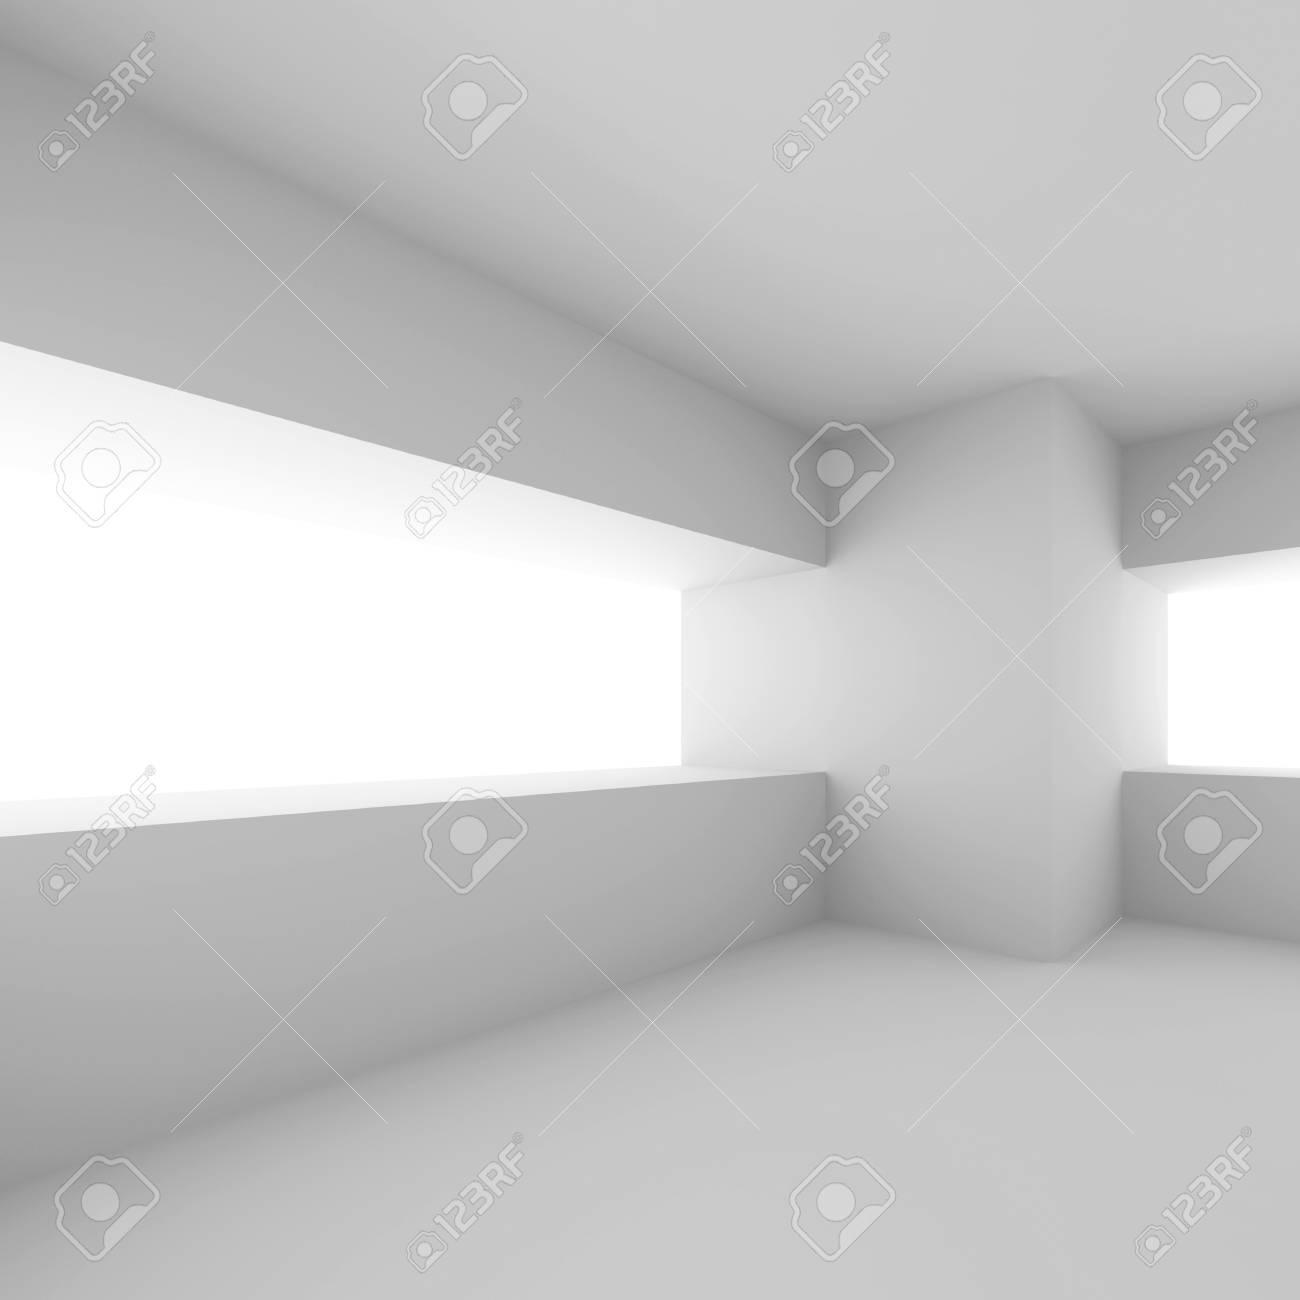 White Modern Empty Room Stock Photo - 10026931